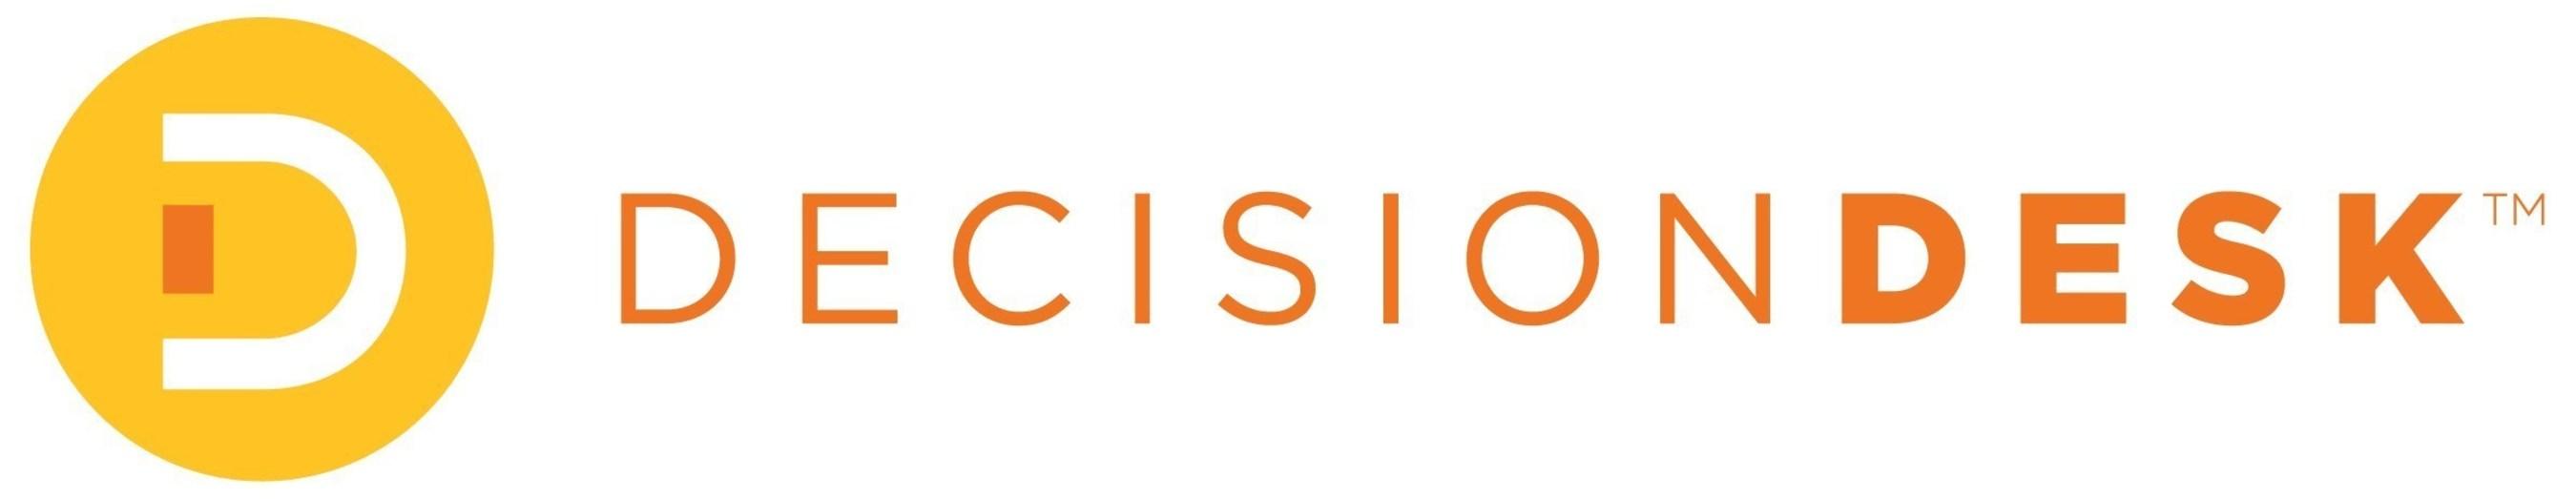 DecisionDesk Logo